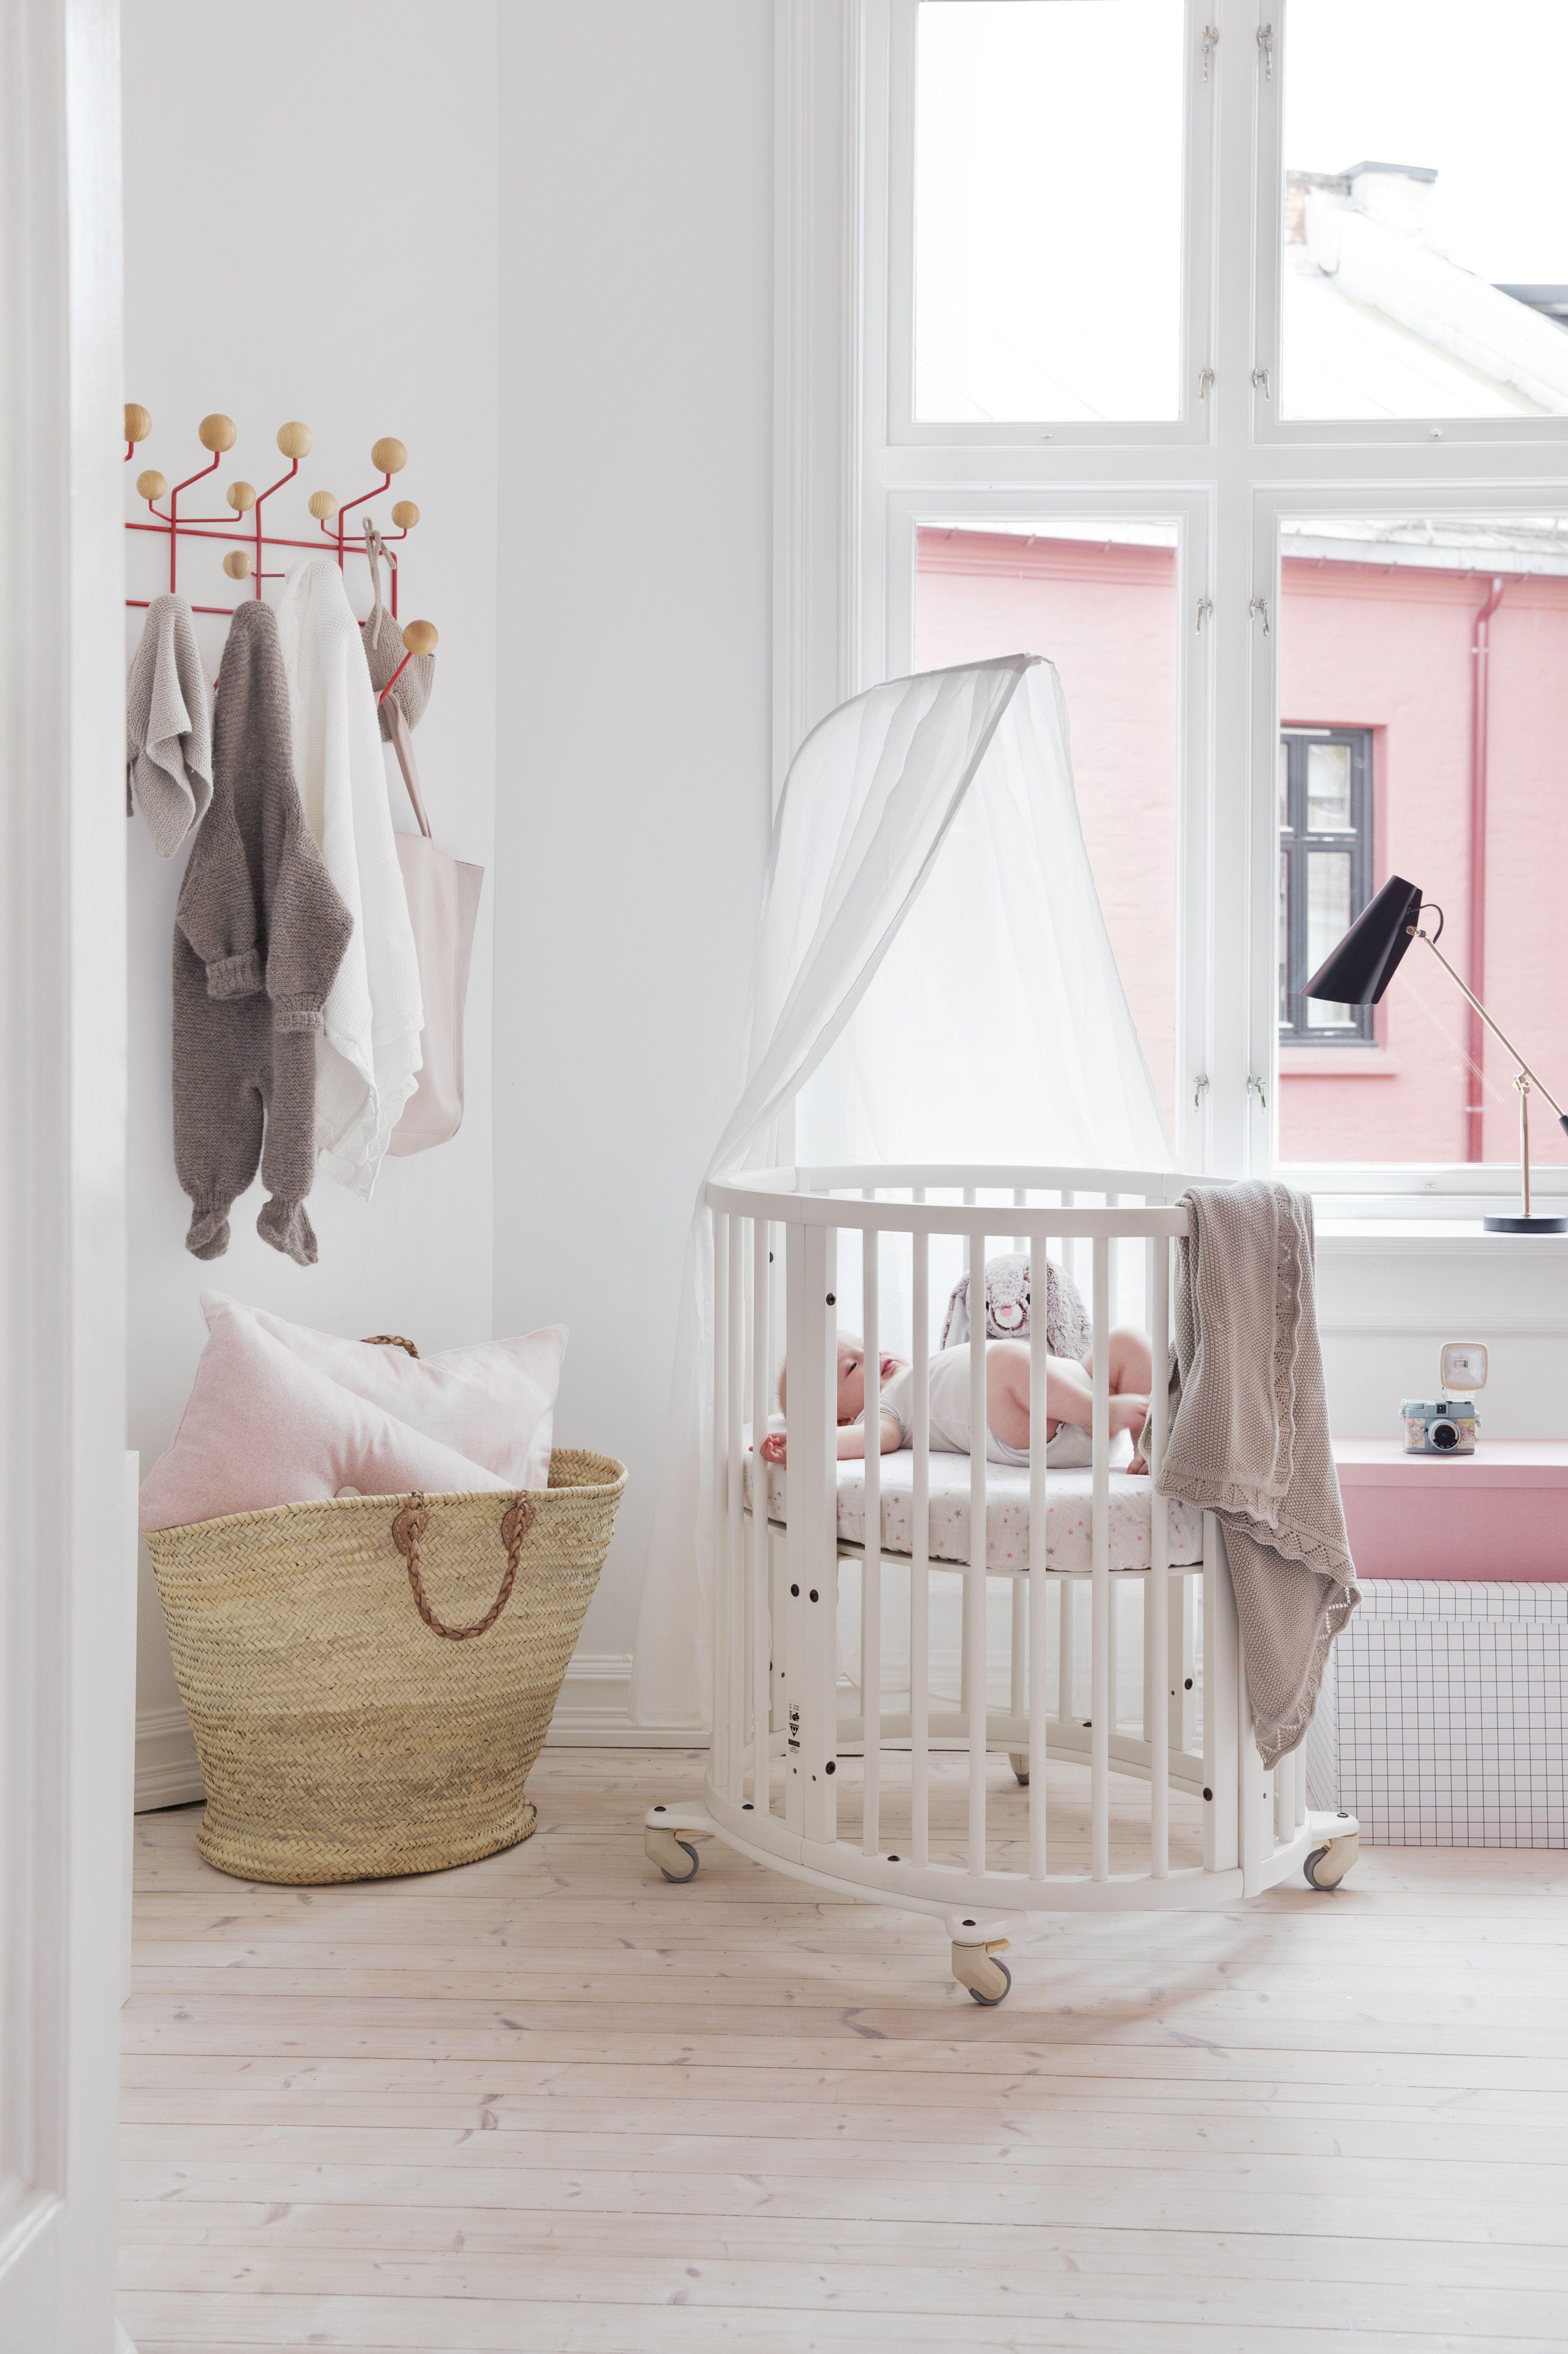 Stunning Scandinavian Designed Oval Shaped Baby Crib